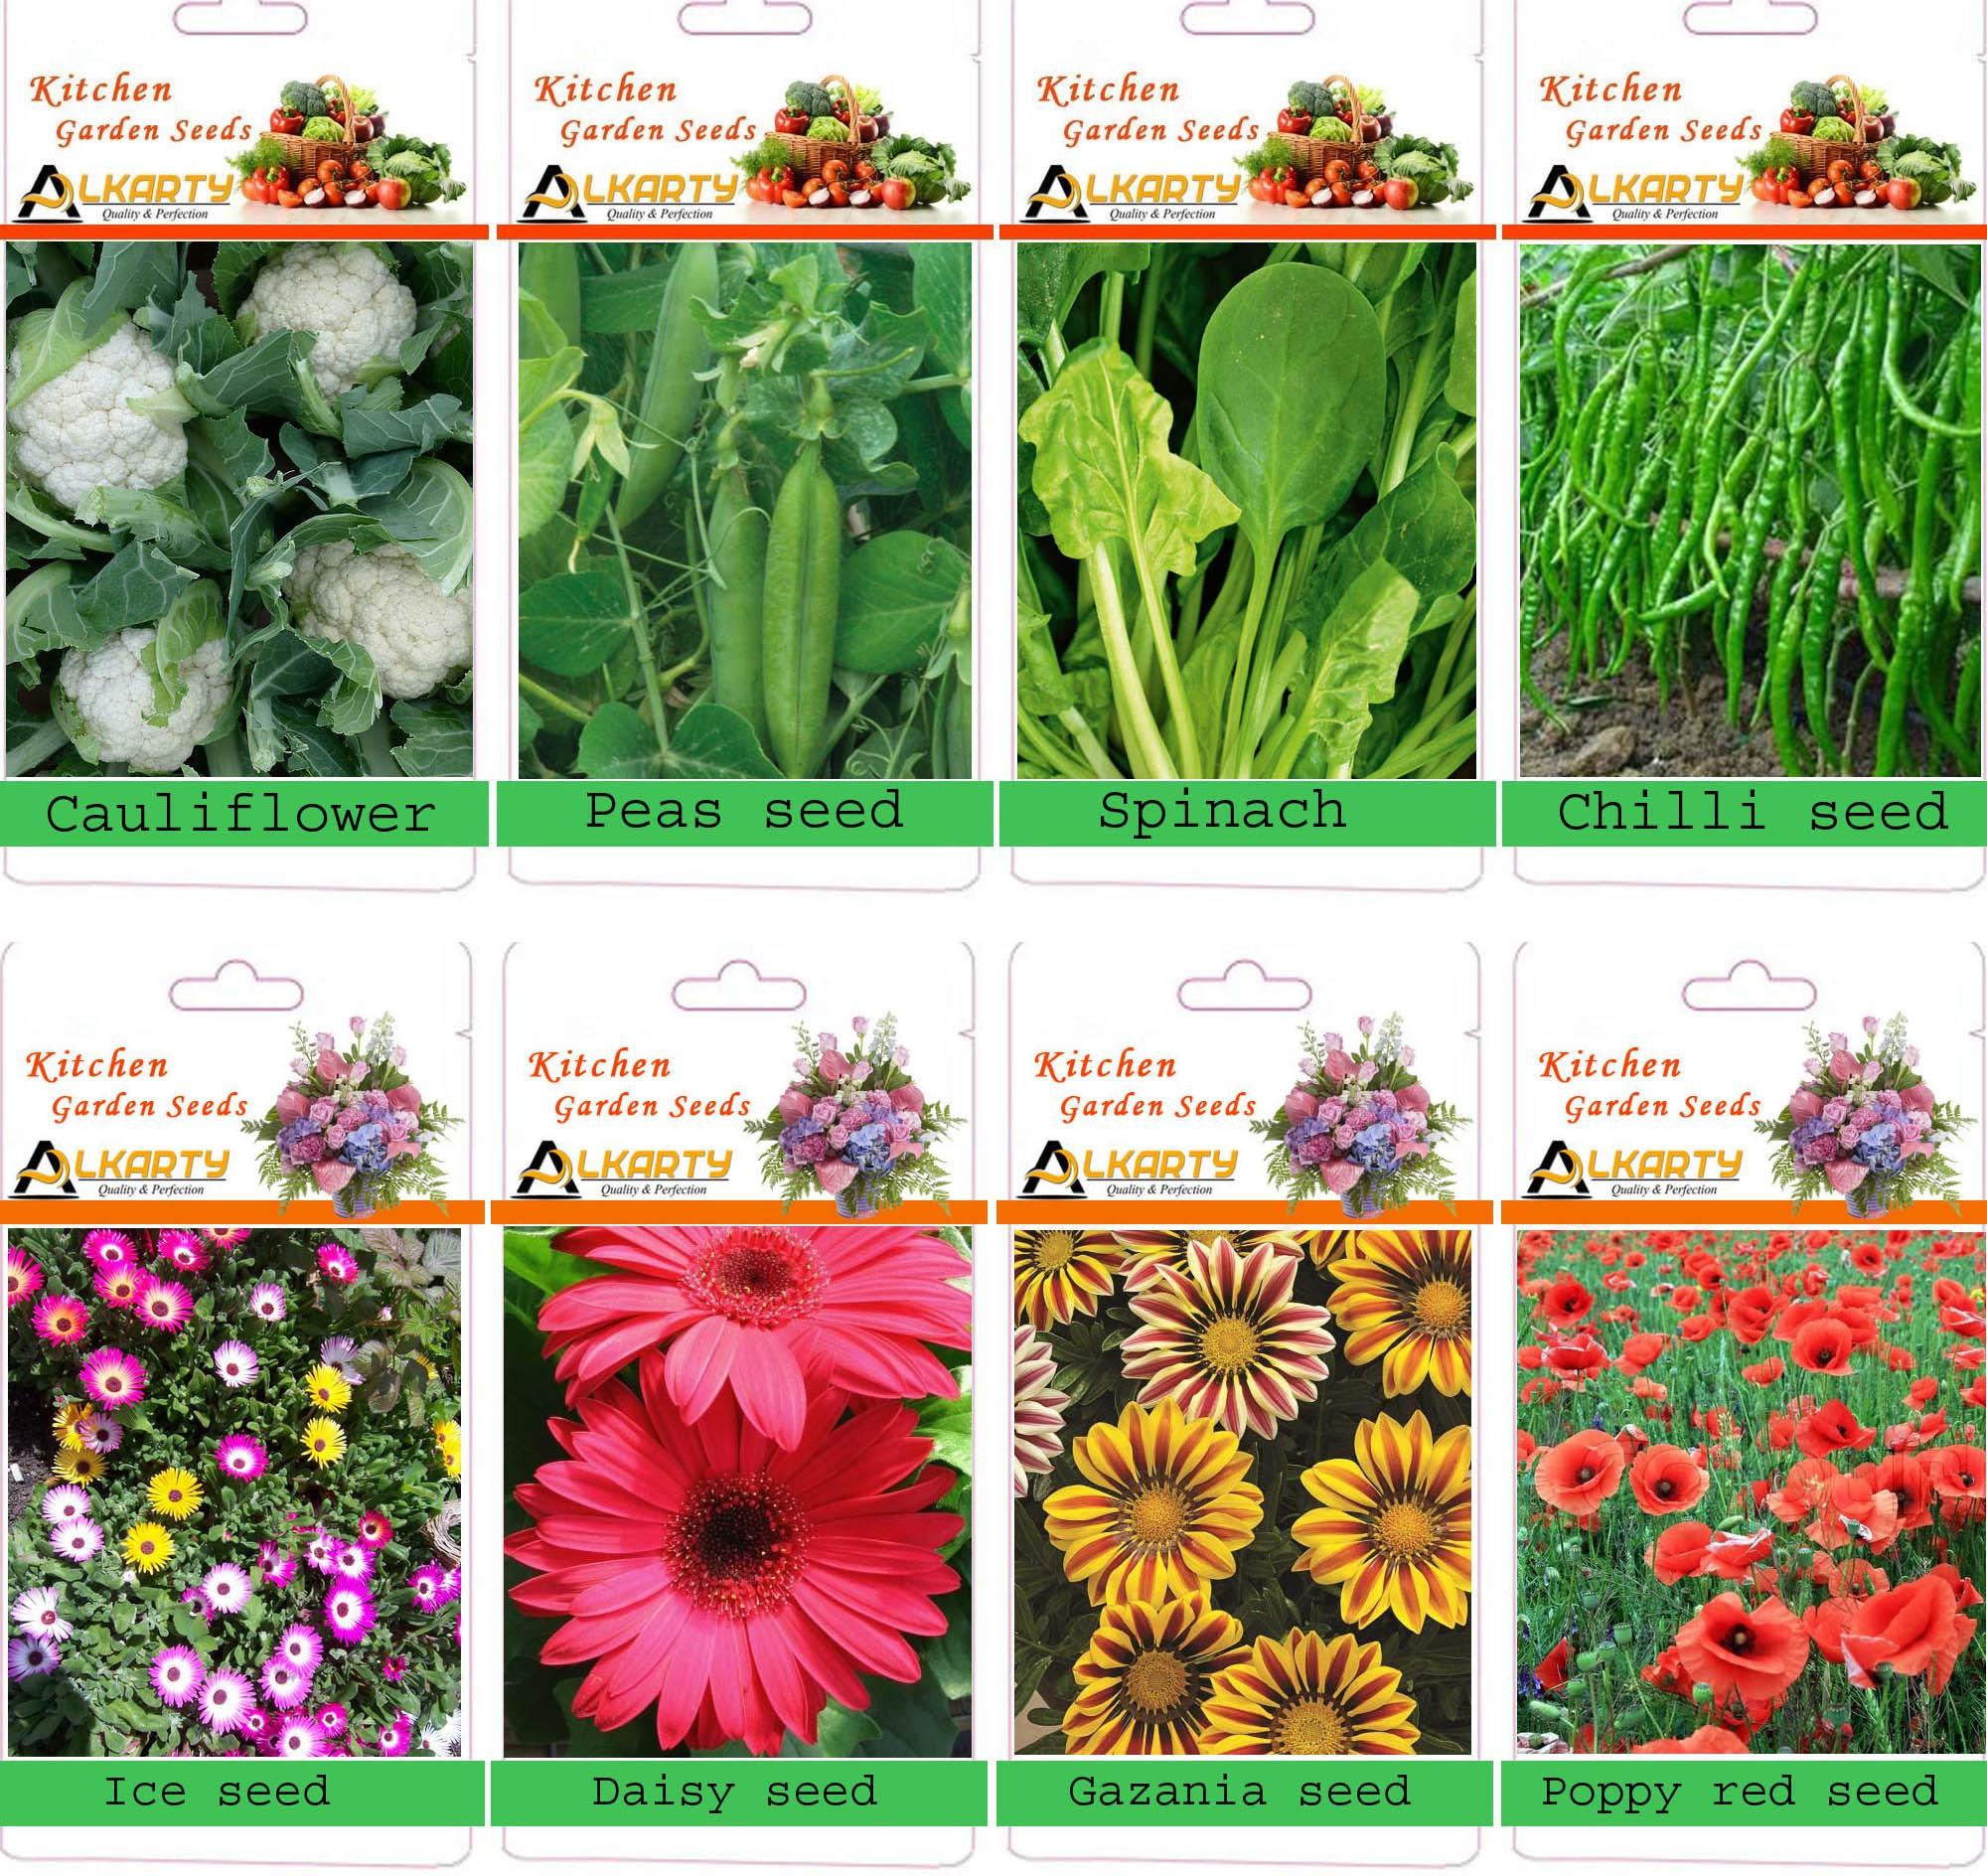 kitchen garden seeds online india container gardening ideas vegetable seeds flower grow bags online india